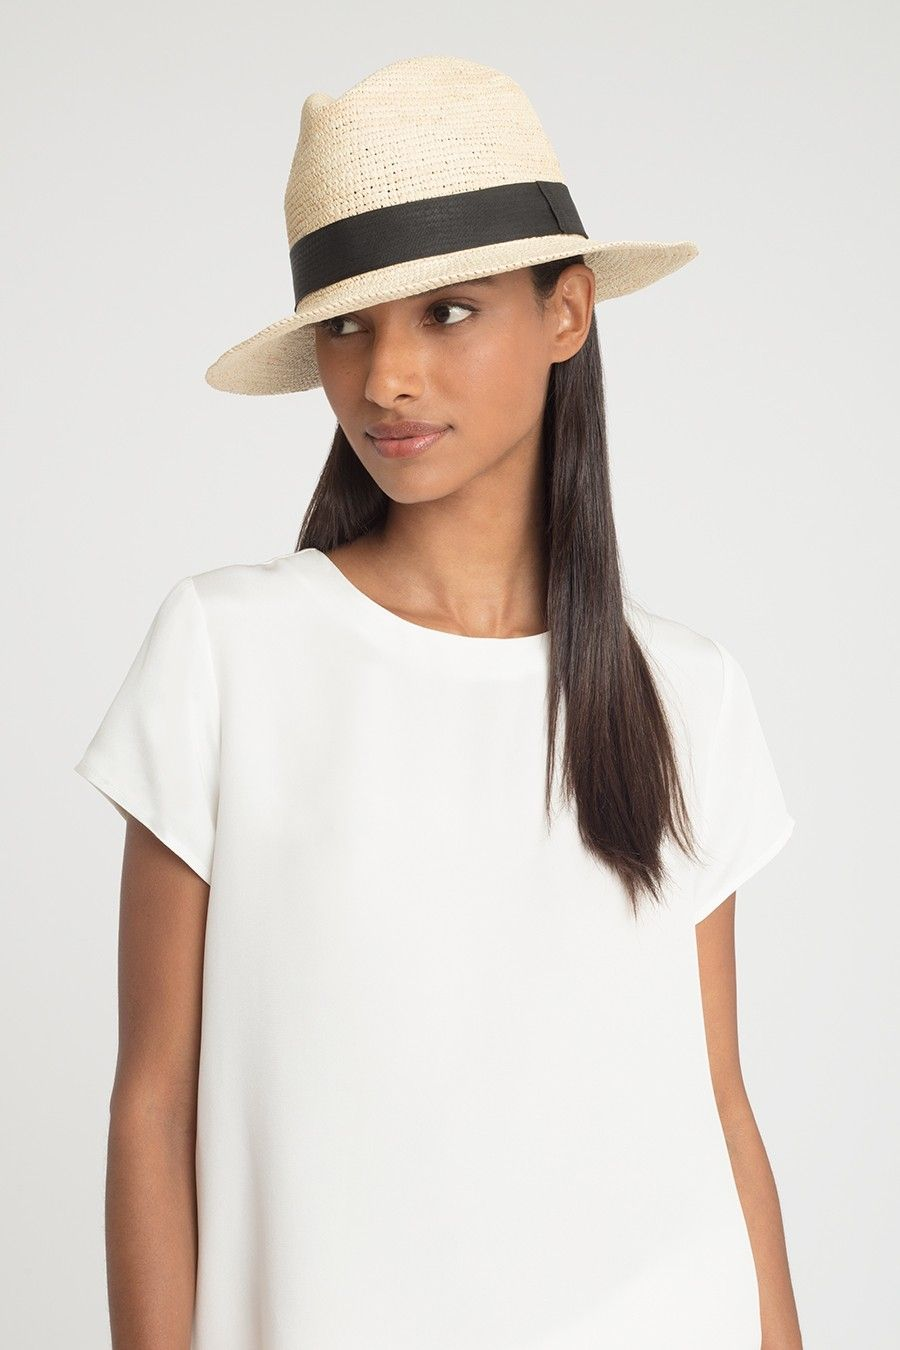 d33a2570c Folding Panama Hat | Clothes | Panama hat, Hats, Panama